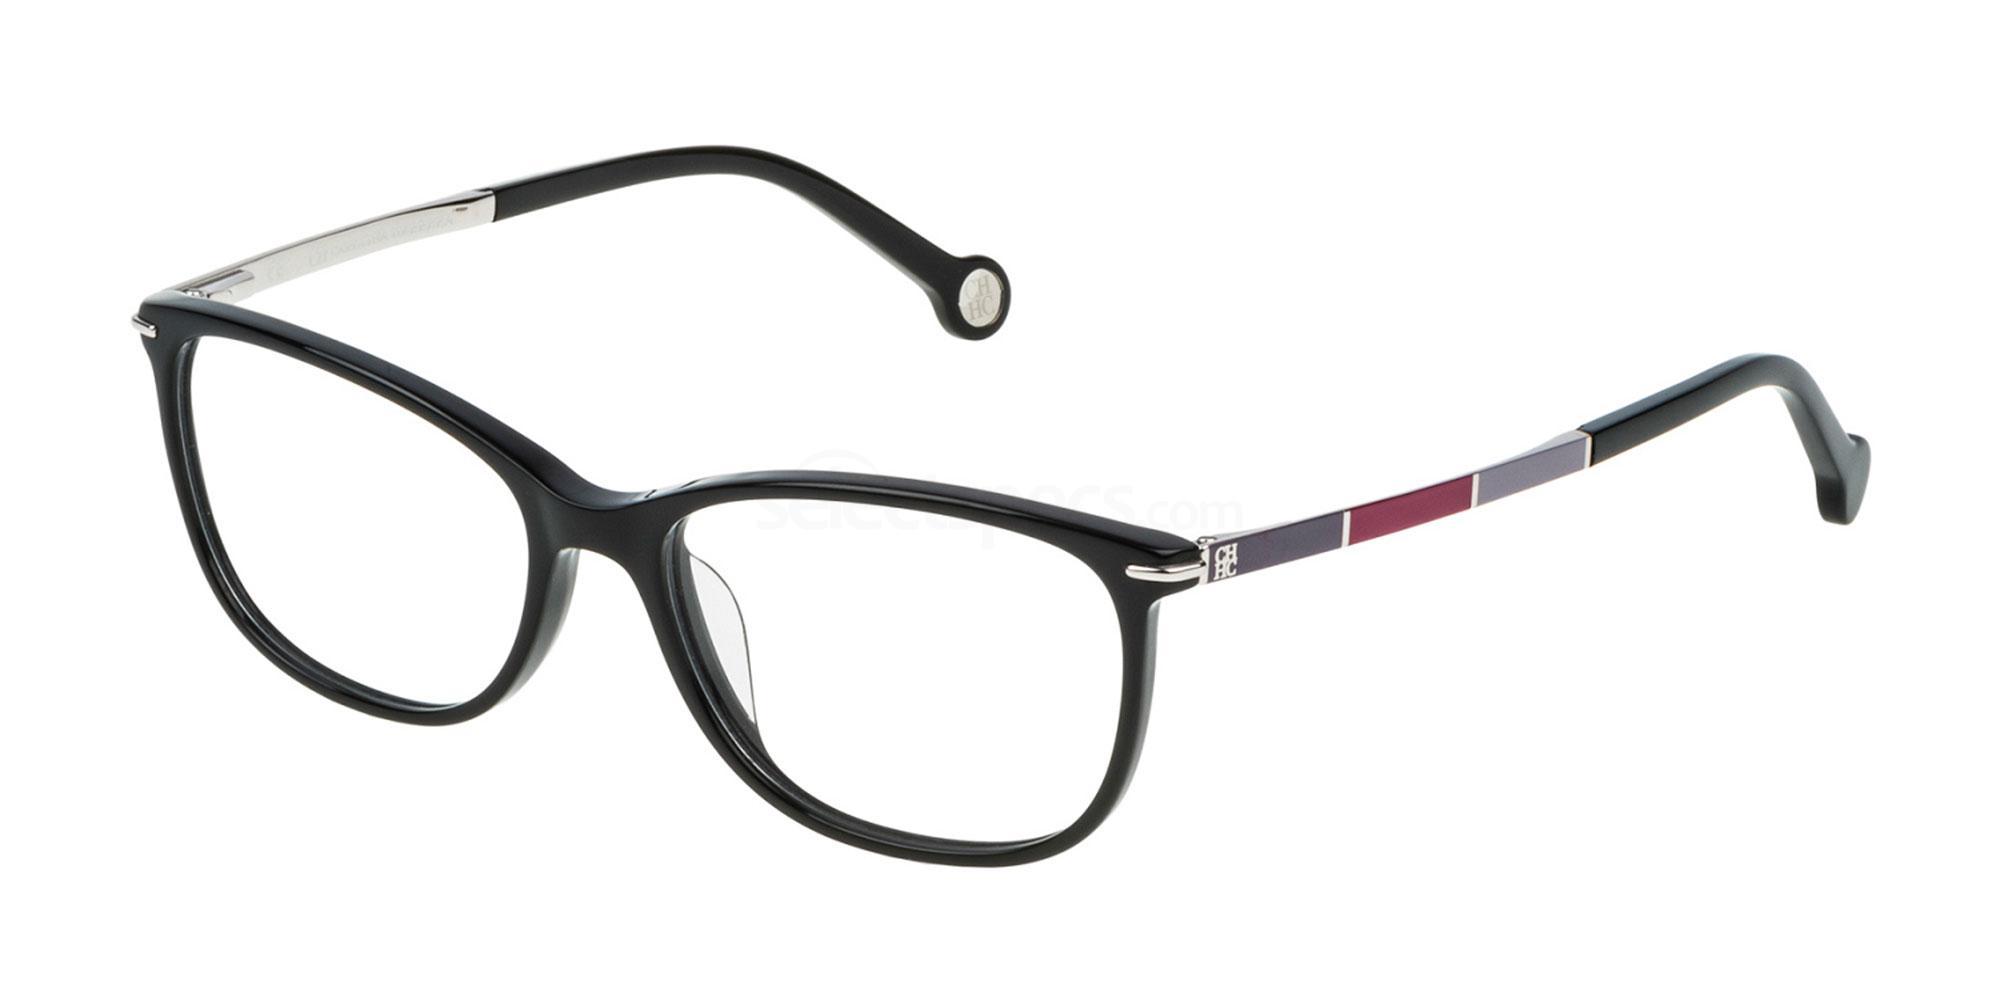 0700 VHE670 Glasses, CH Carolina Herrera